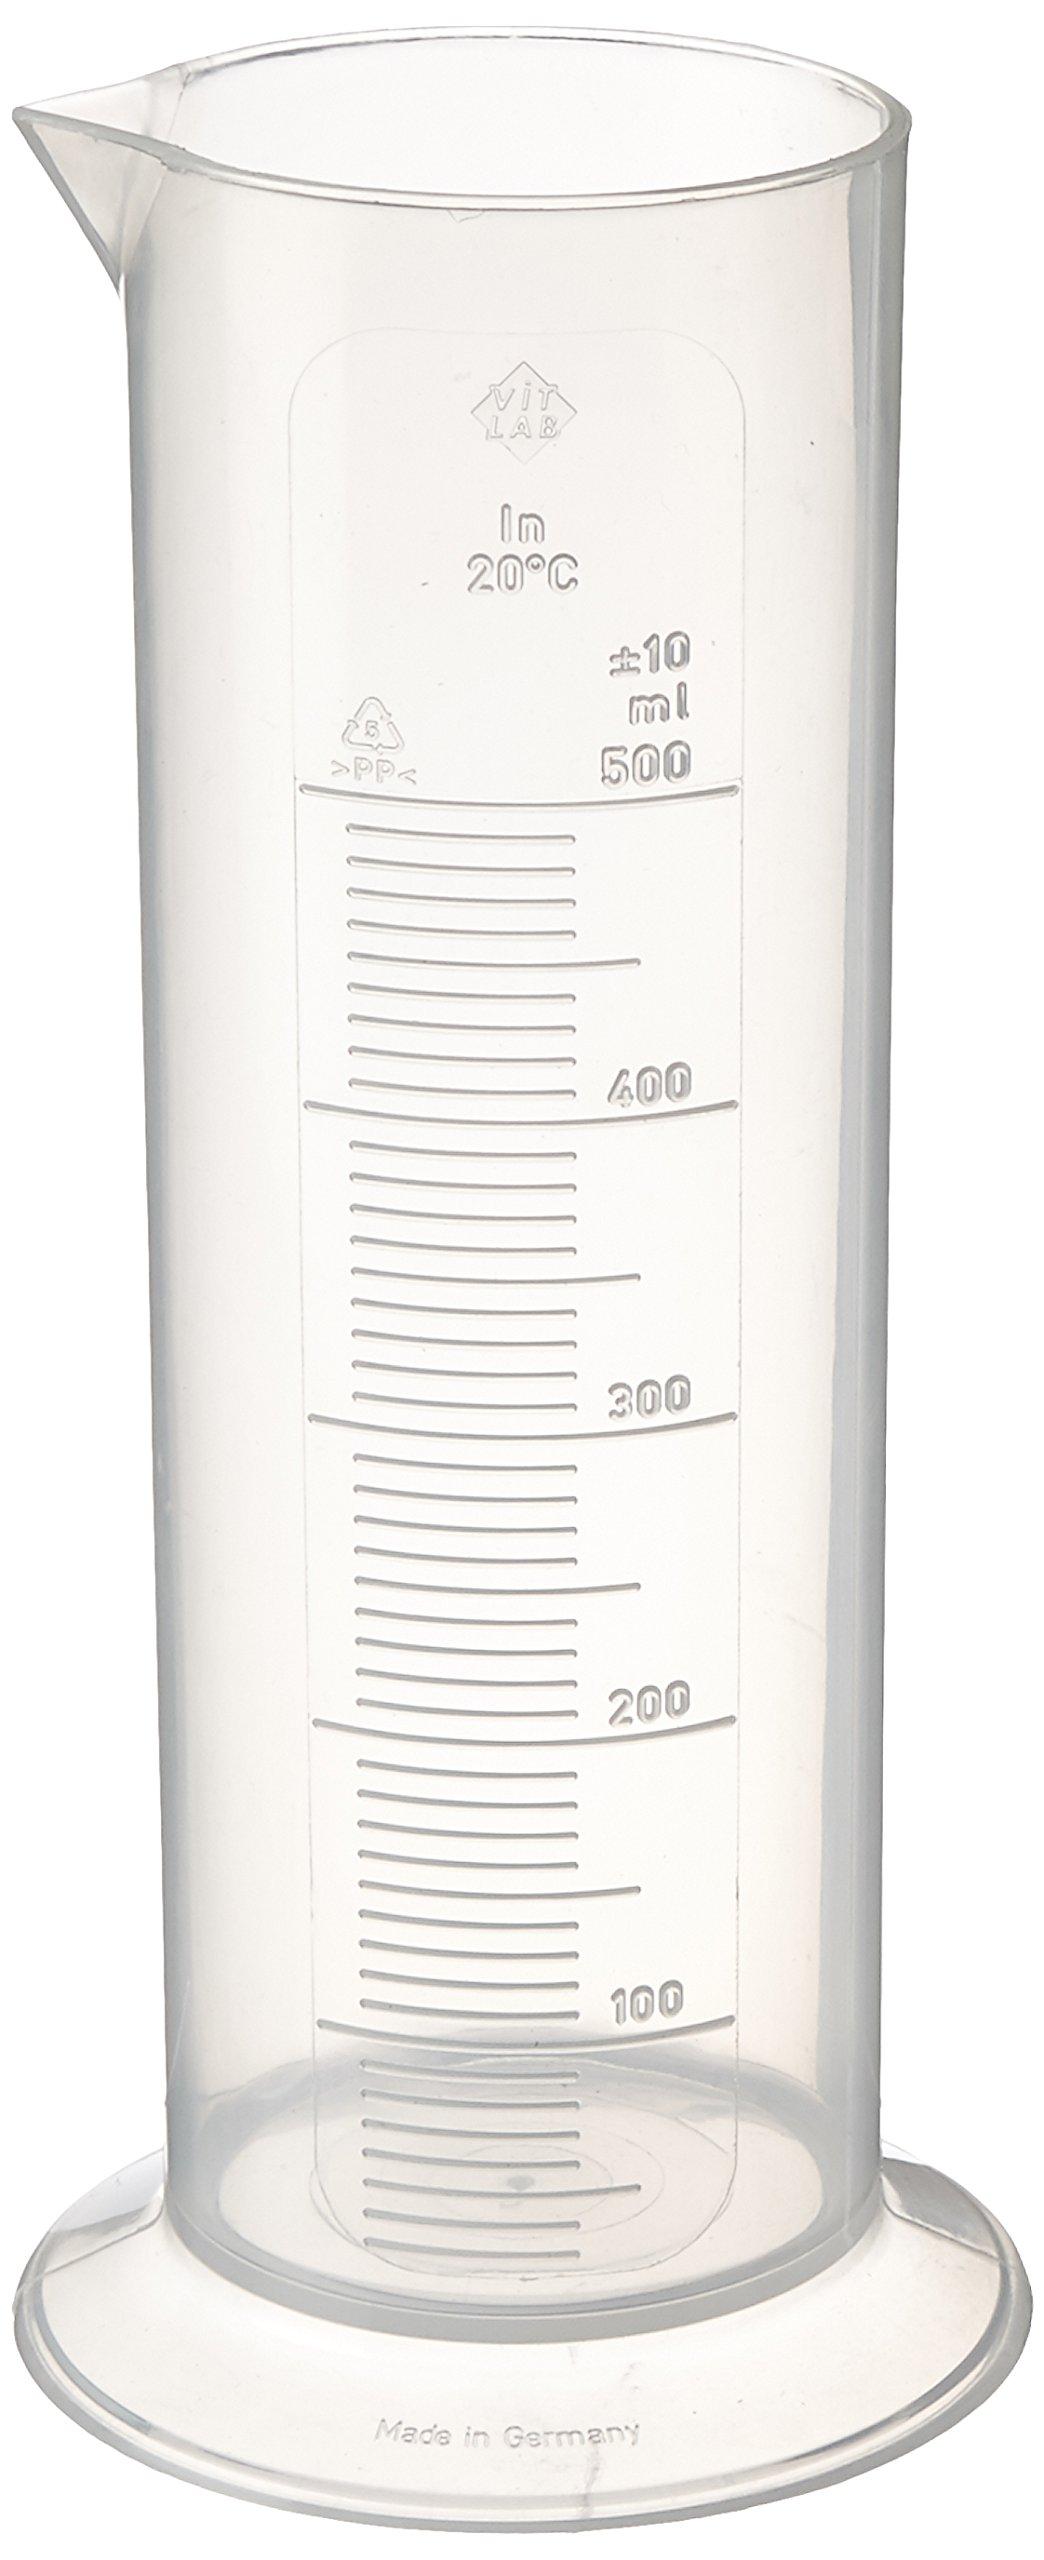 Kaiser 204254 500ml Graduated Cylinder (Black)